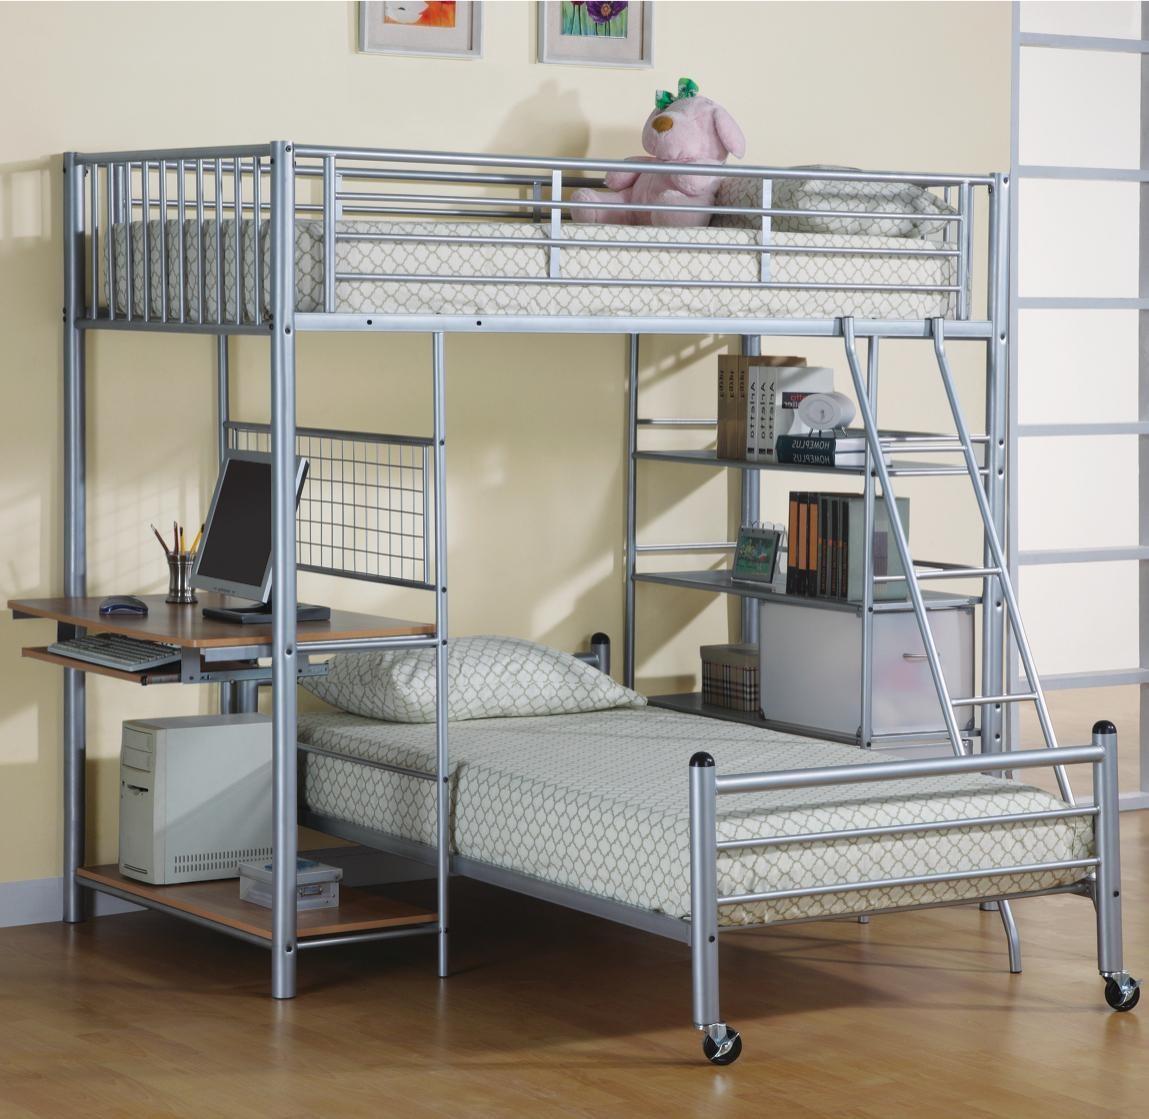 Ikea Full Loft Bed Ideas – HomesFeed